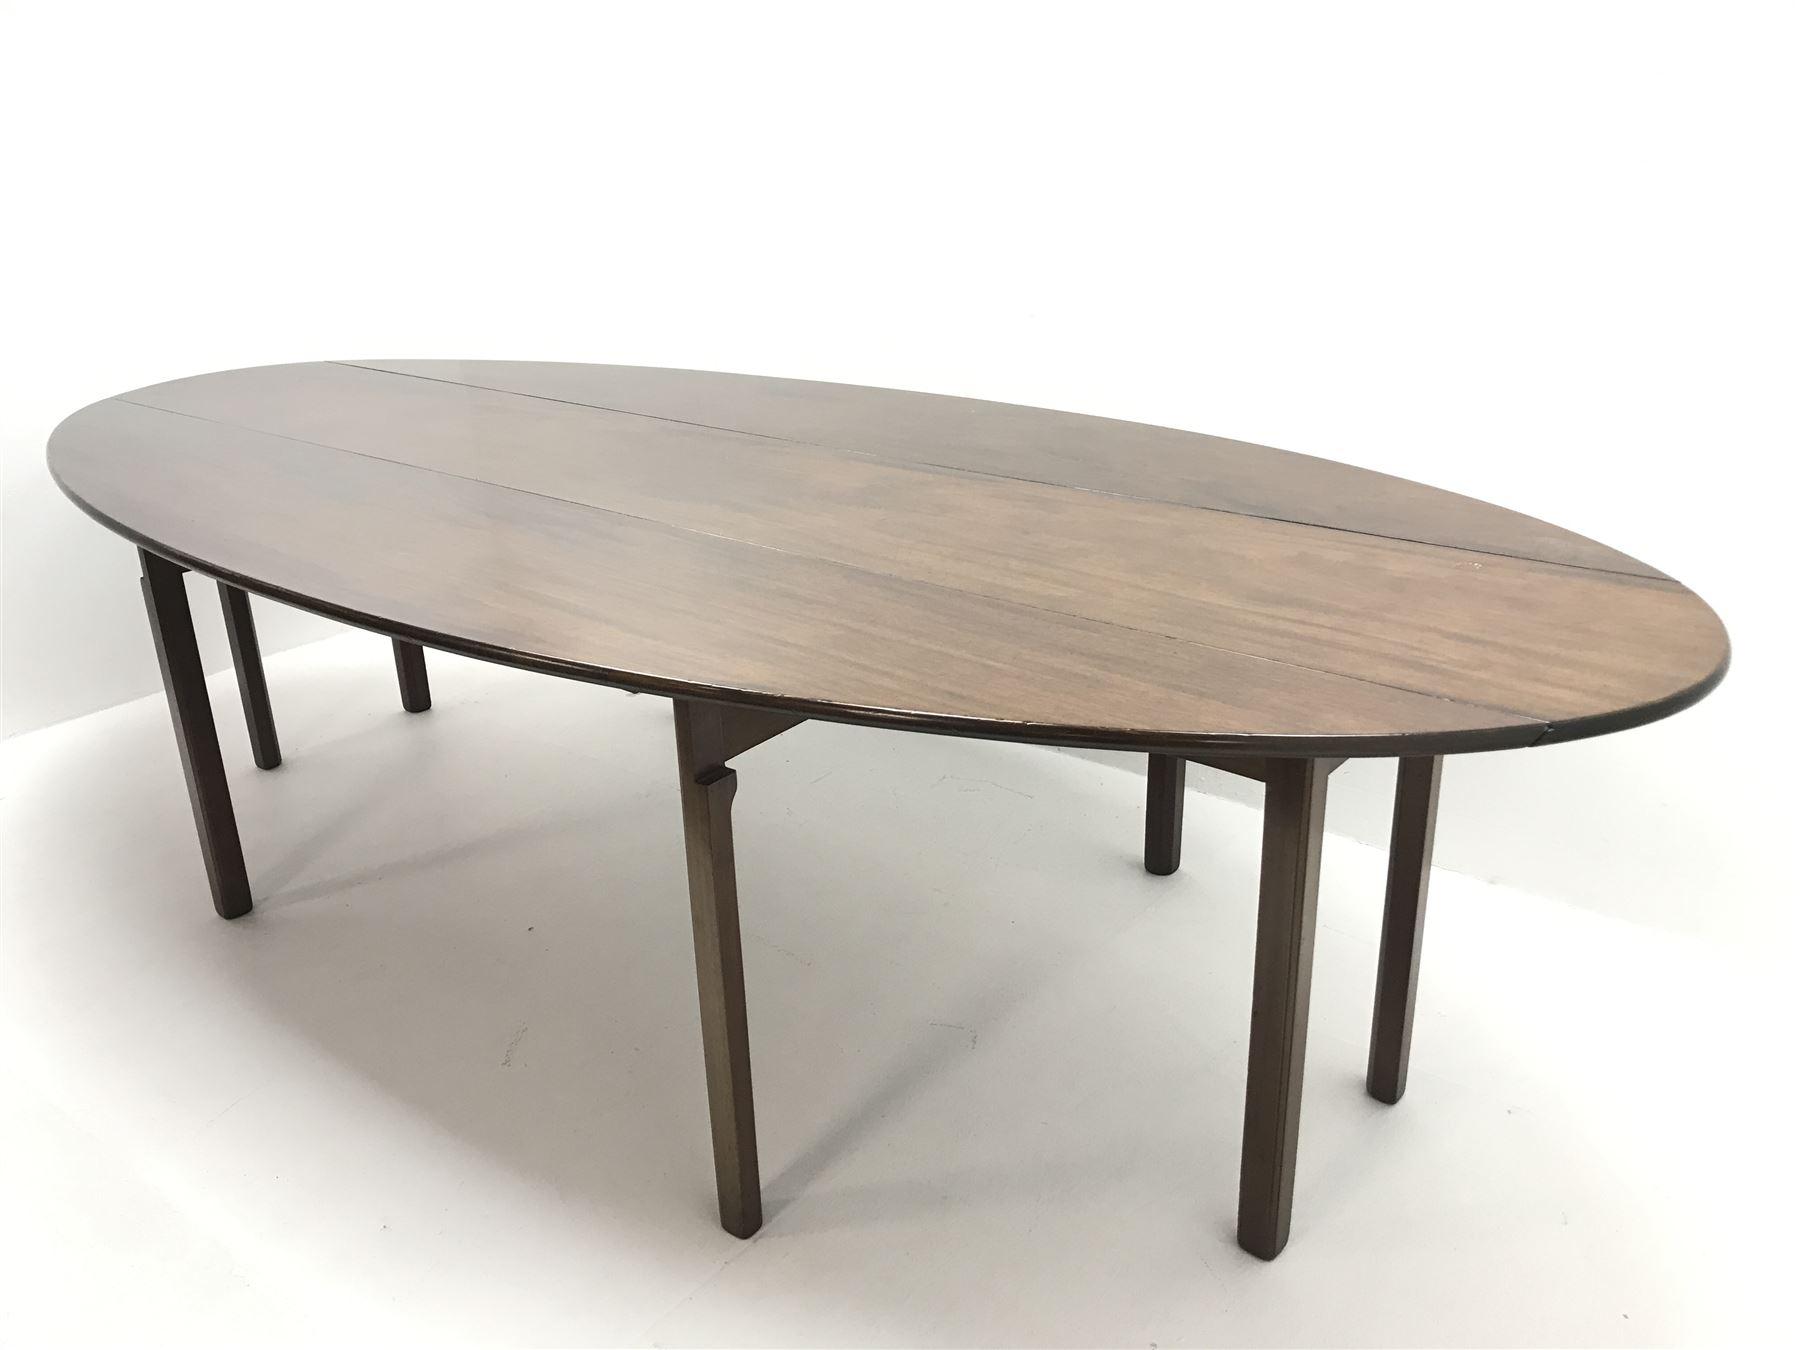 20th century Georgian style mahogany wake table - Image 2 of 2